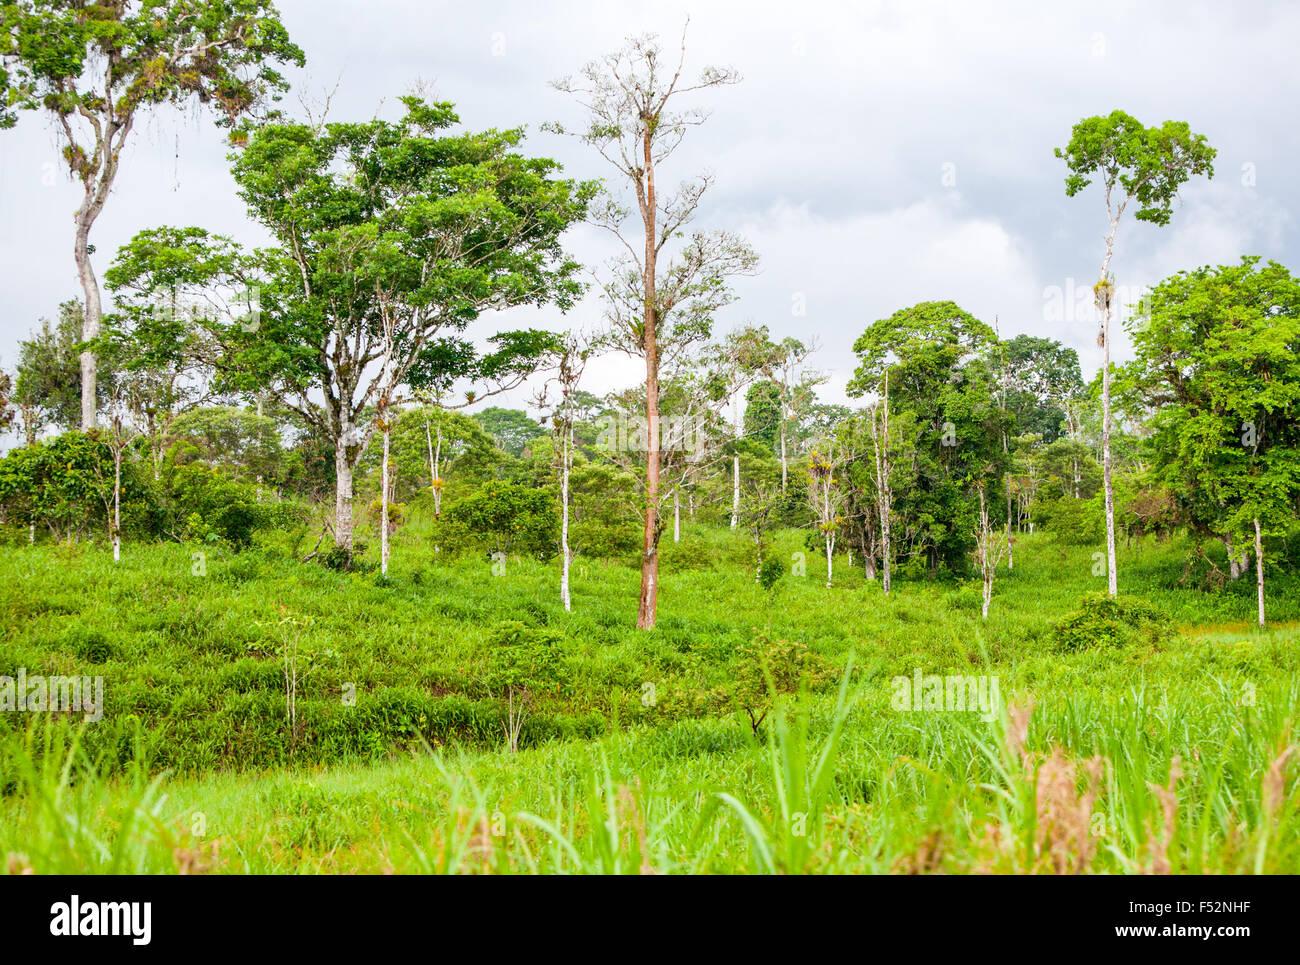 Primary Jungle In Ecuador Close To The City Of Macas - Stock Image